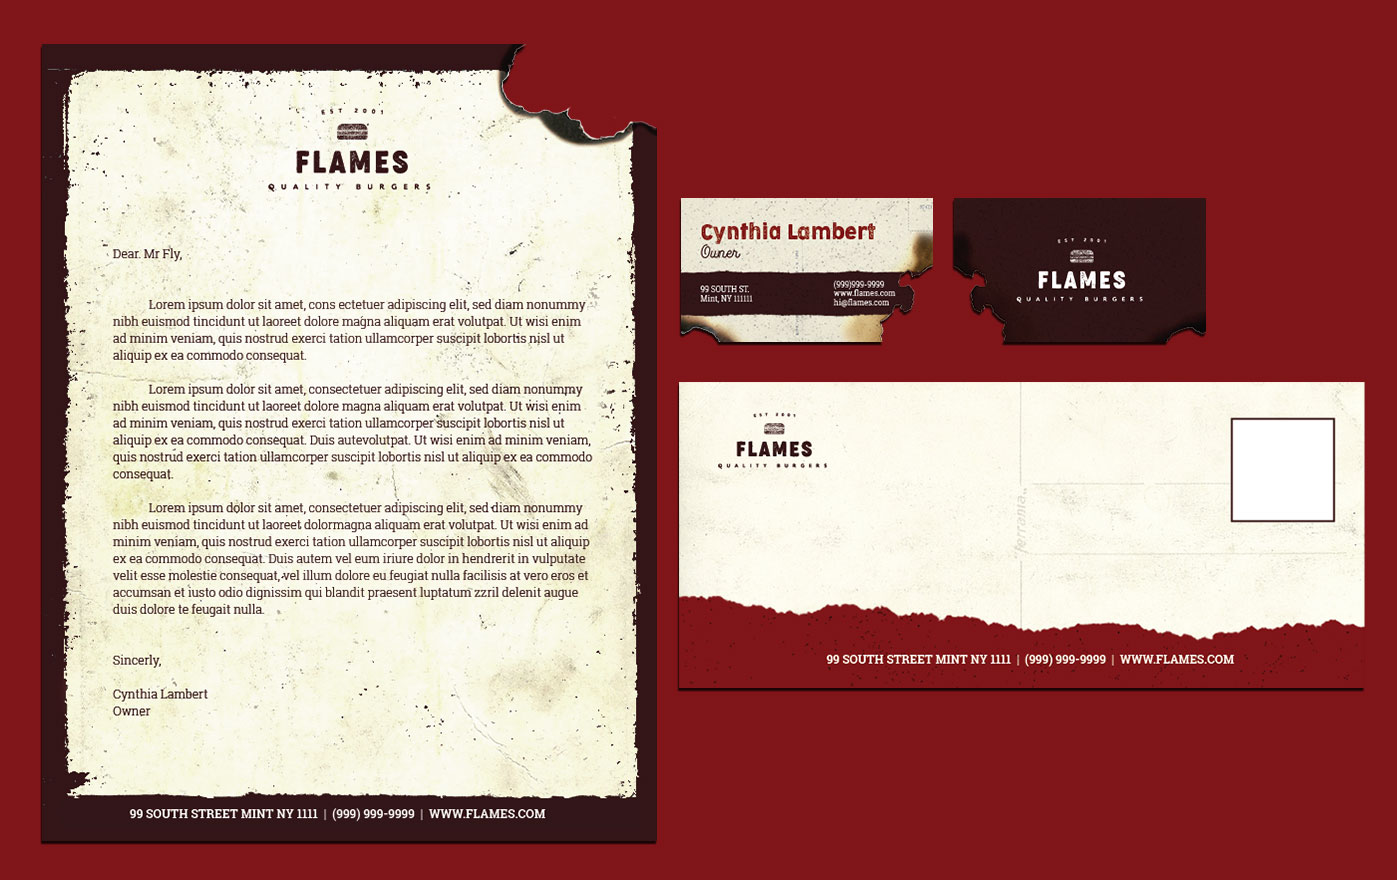 Flames_Brand_Identity-Mockup-v3.jpg